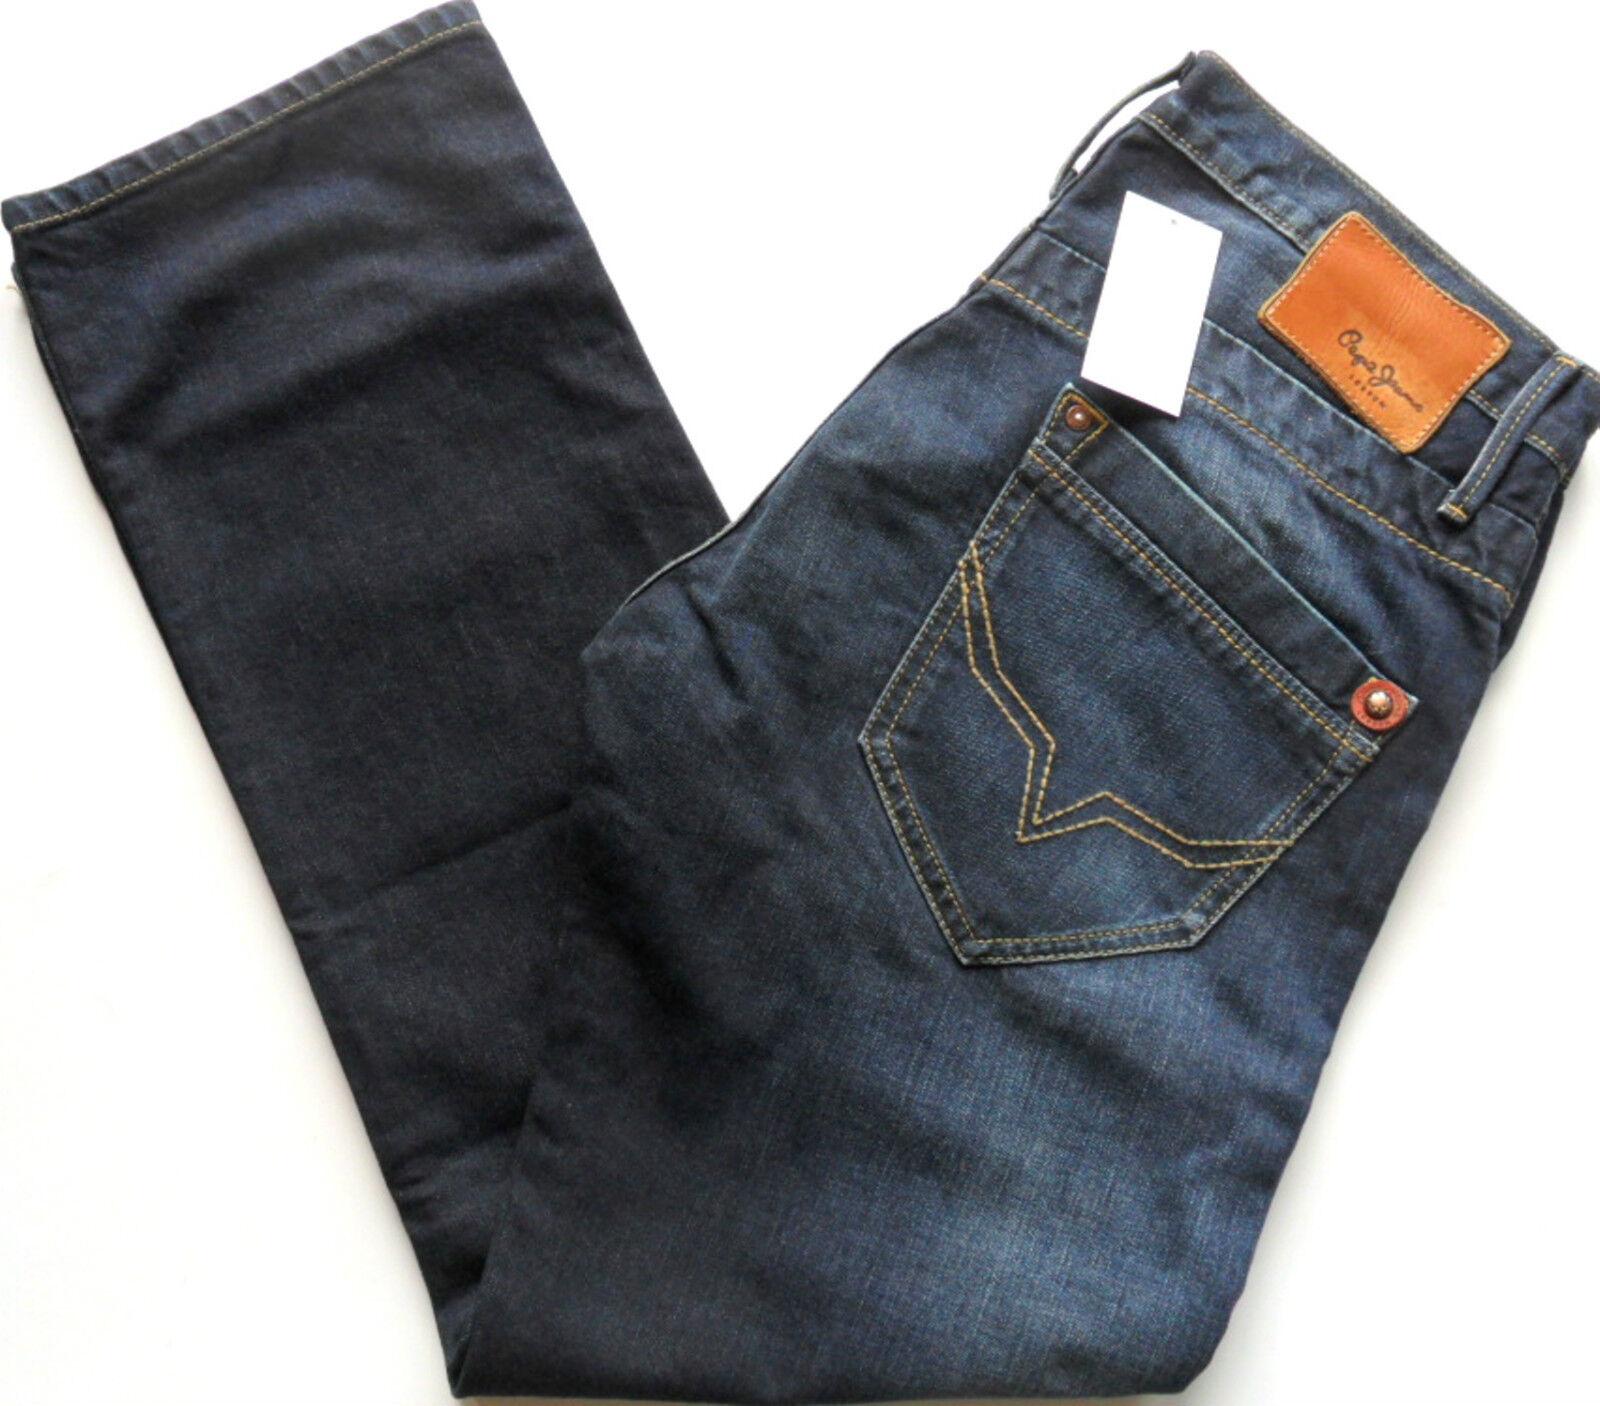 PEPE PEPE PEPE JEANS Men's Tooting Regular Fit Straight Leg Denim Dark Blau W 30  - 36  4f2837